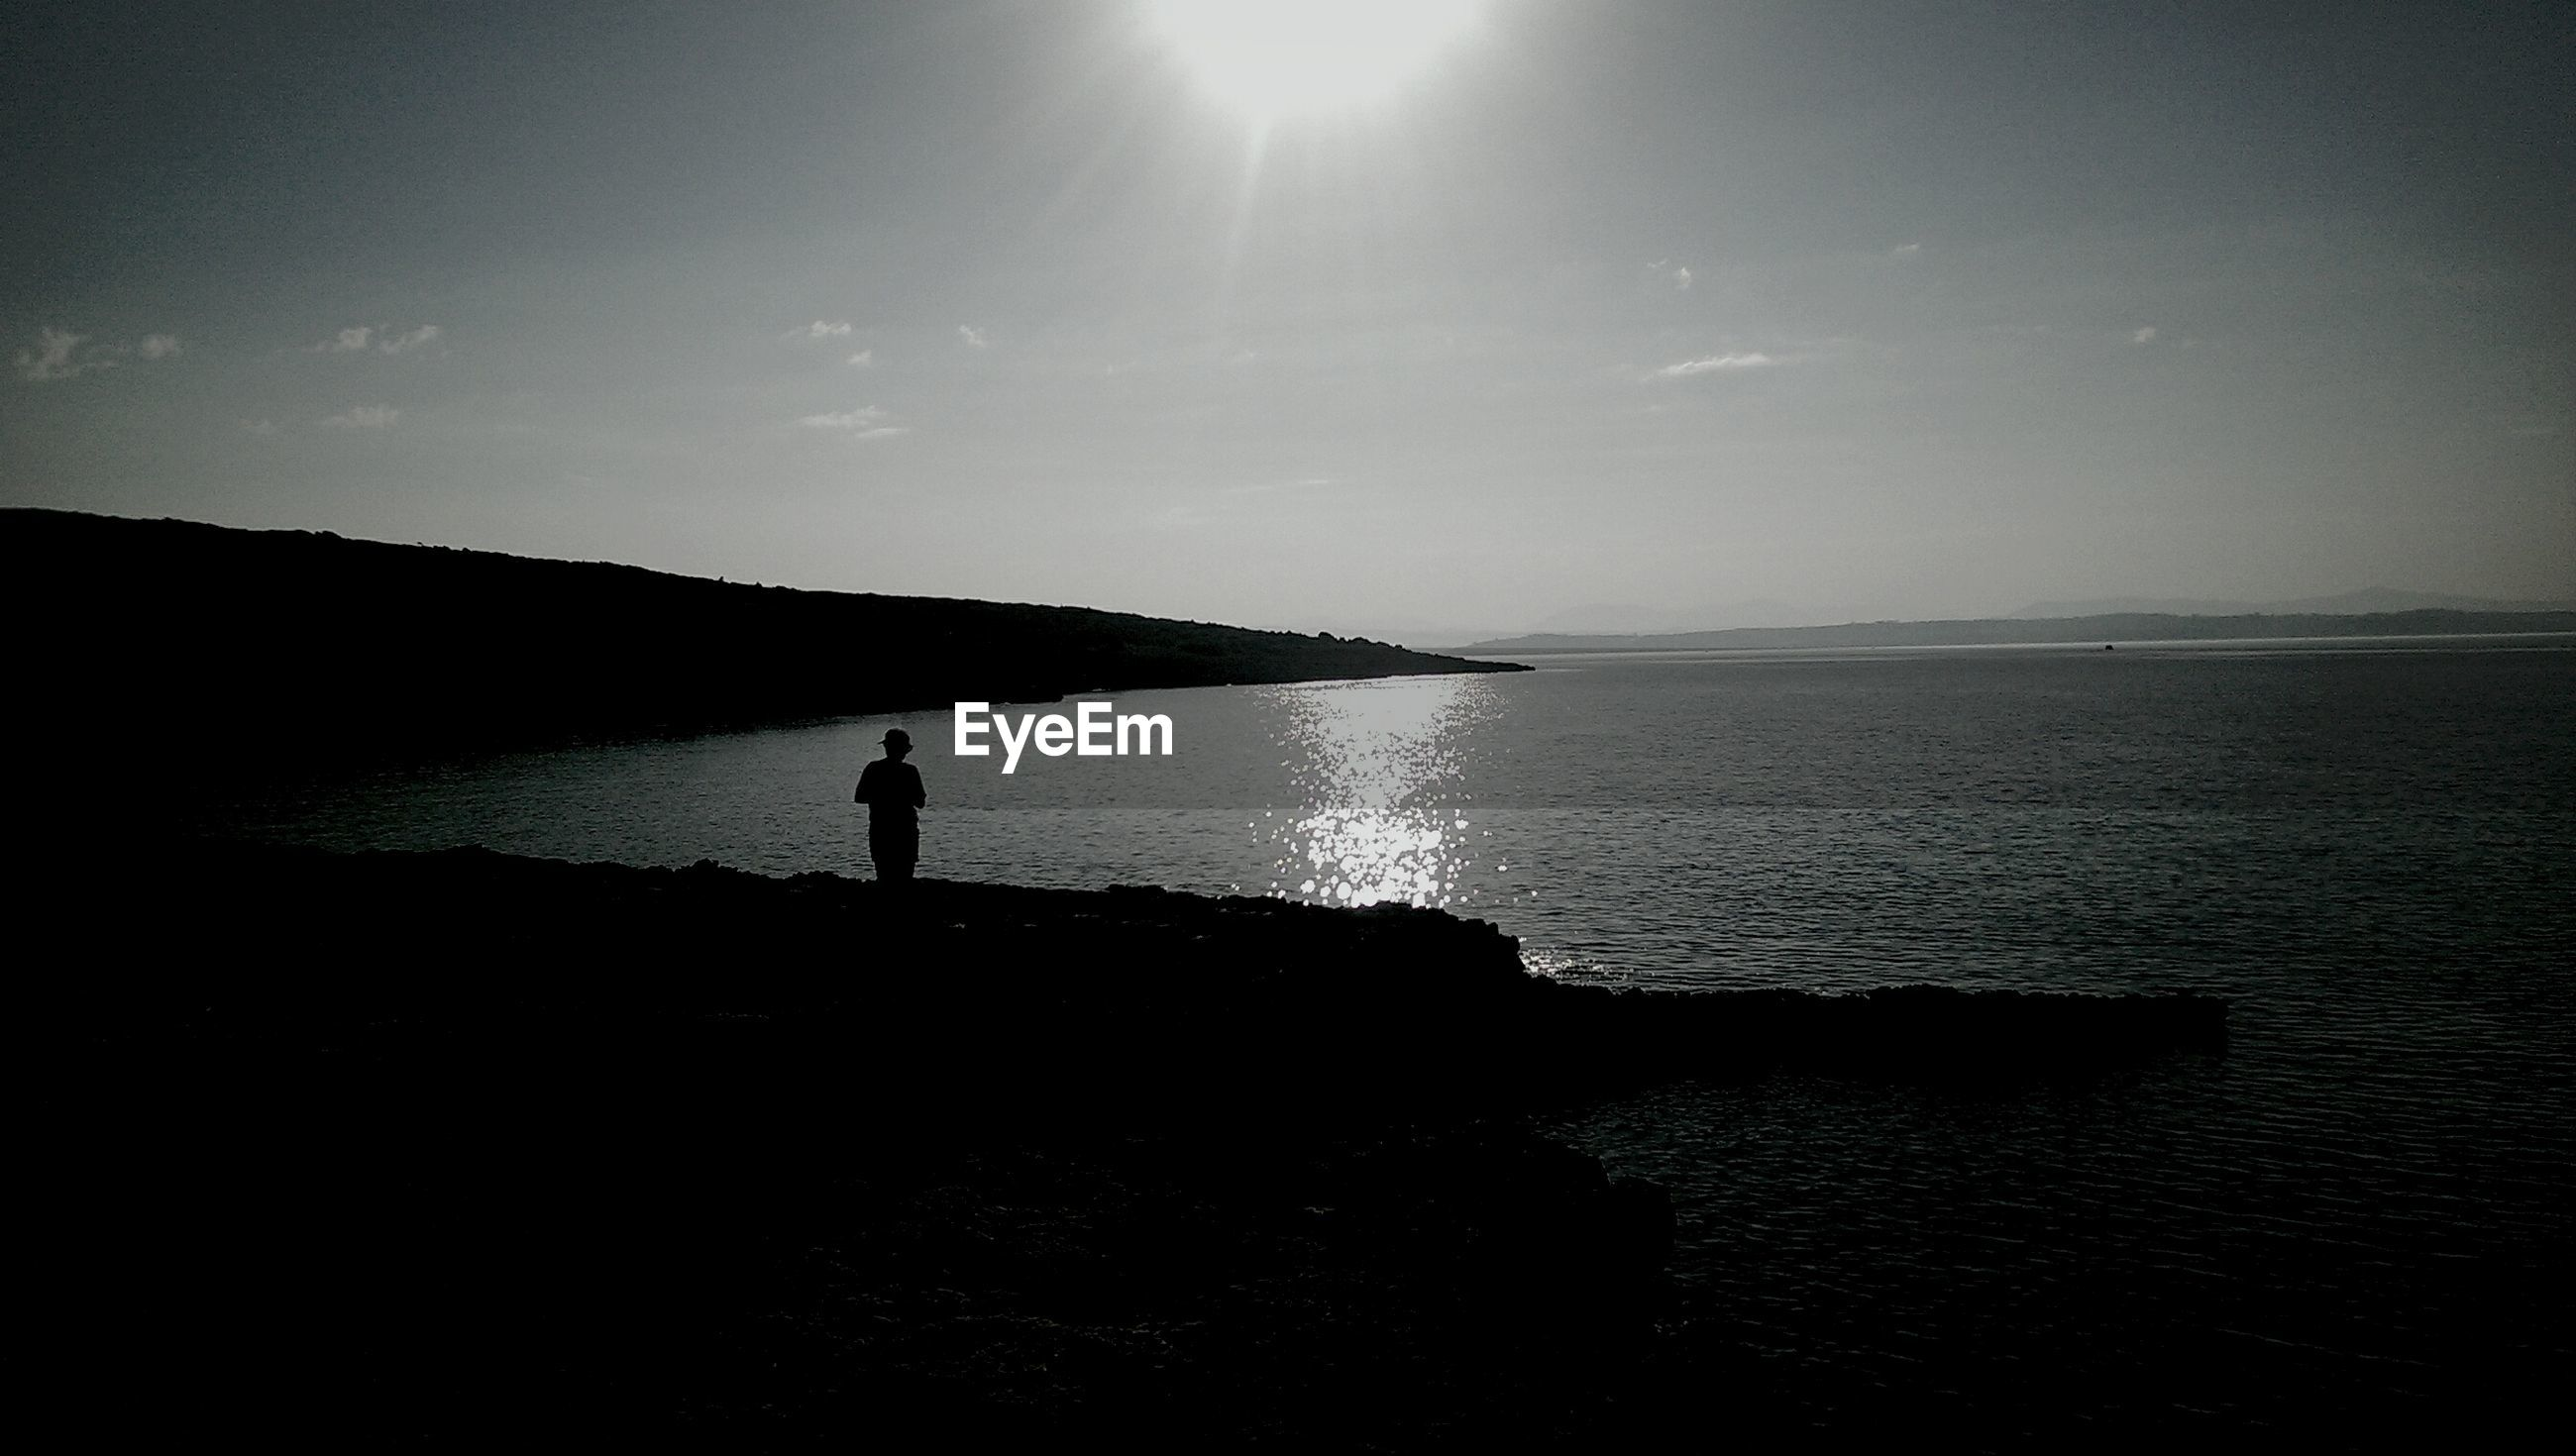 Lone person on shore